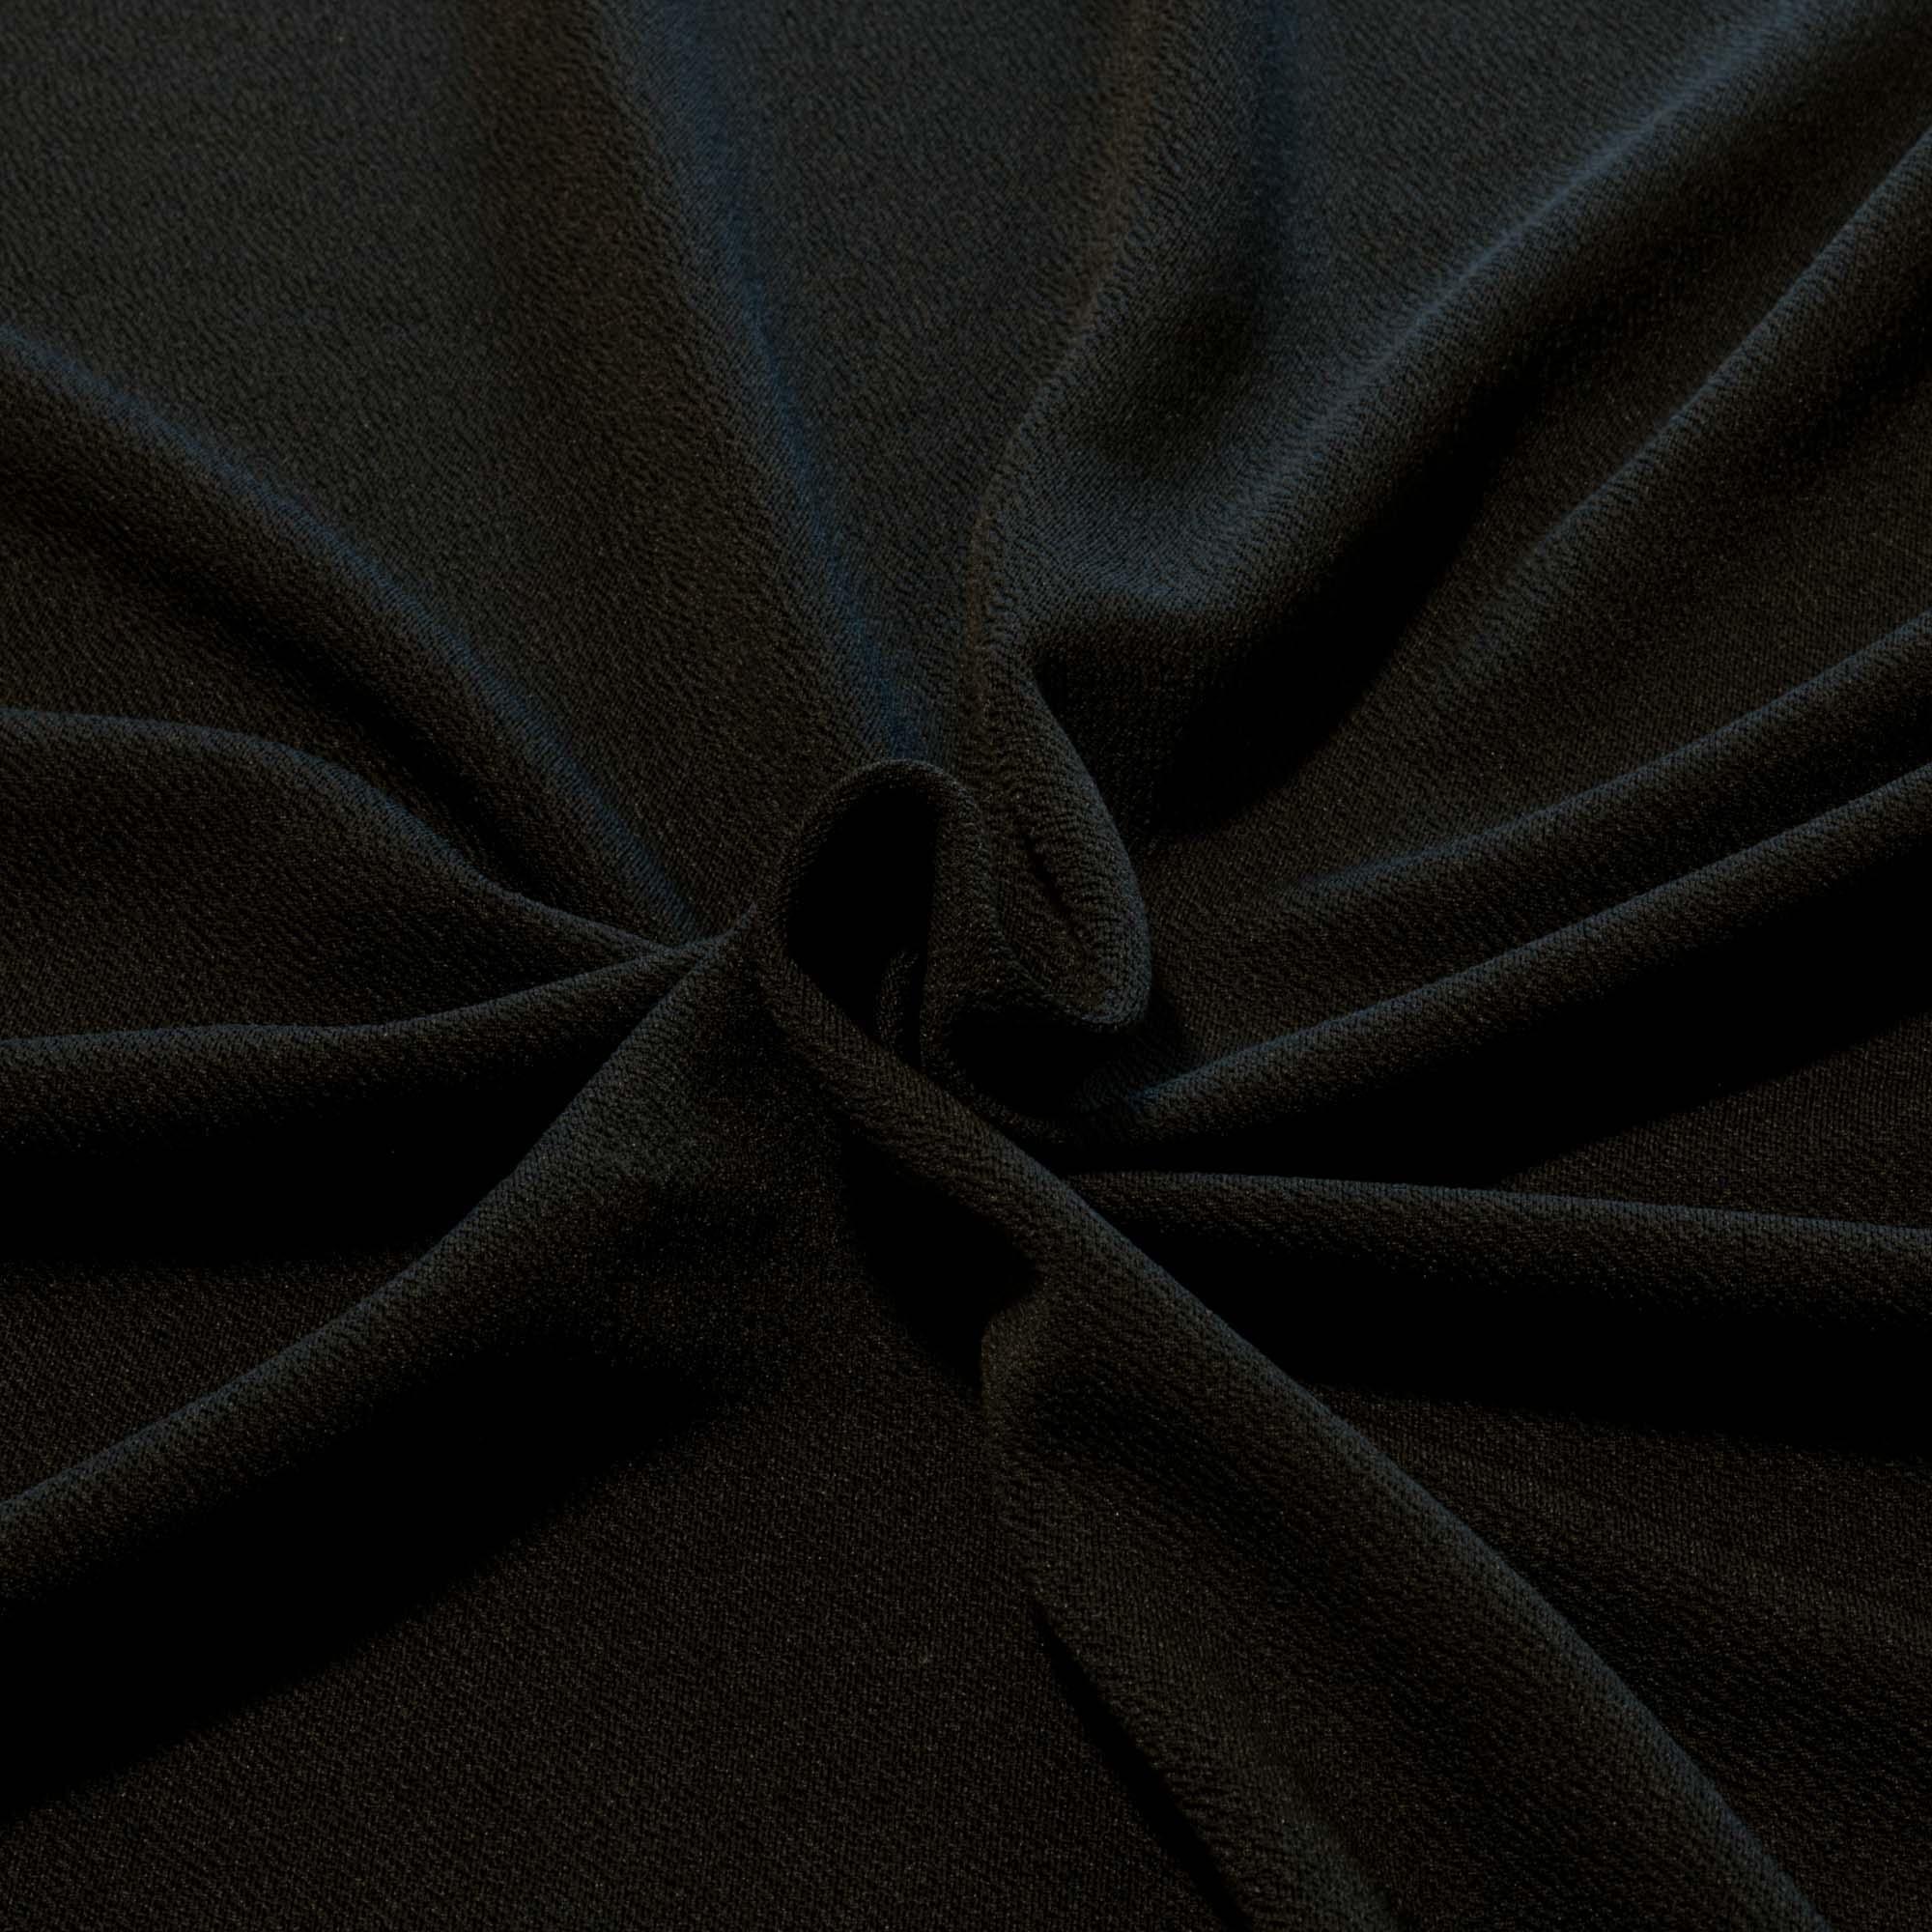 Tecido Crepe de Malha 1,60 m Largura Preto